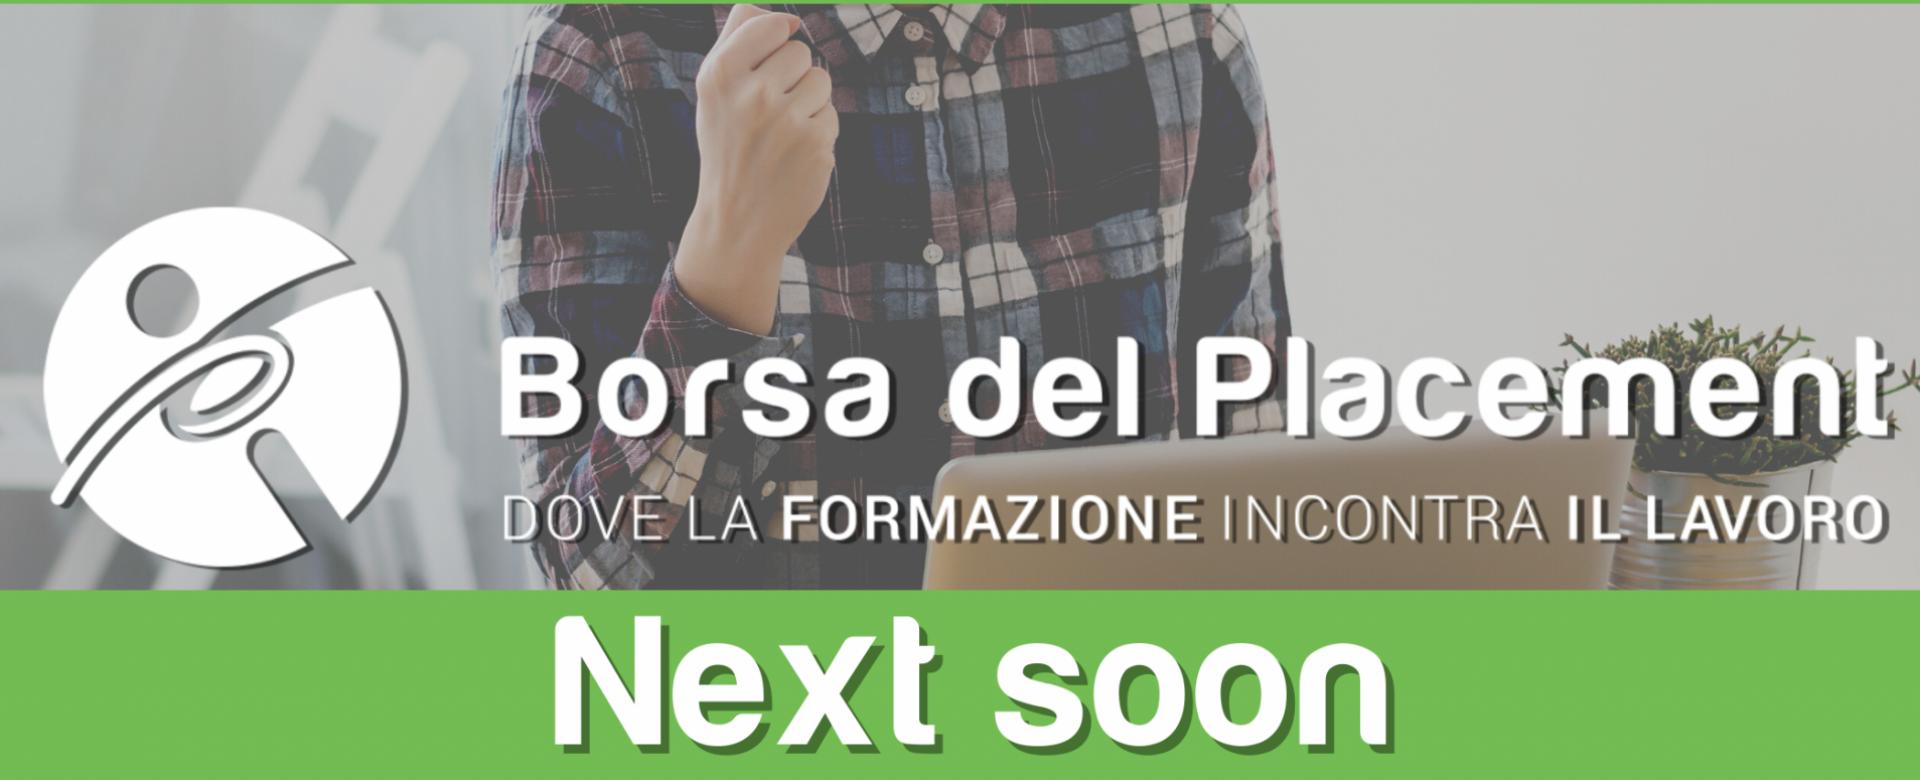 23.06.2020 - Borsa del Placement: Next Soon!